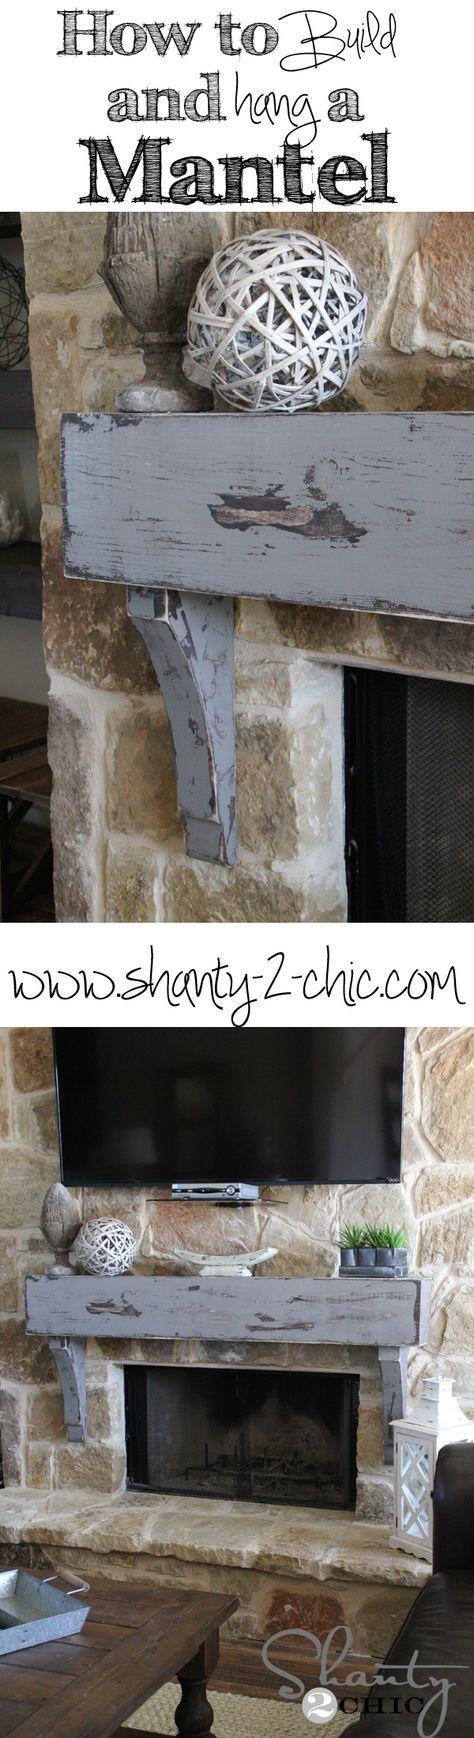 Mantel On Stone Fireplace Best 25 Stone Fireplace Mantel Ideas On Pinterest Stone